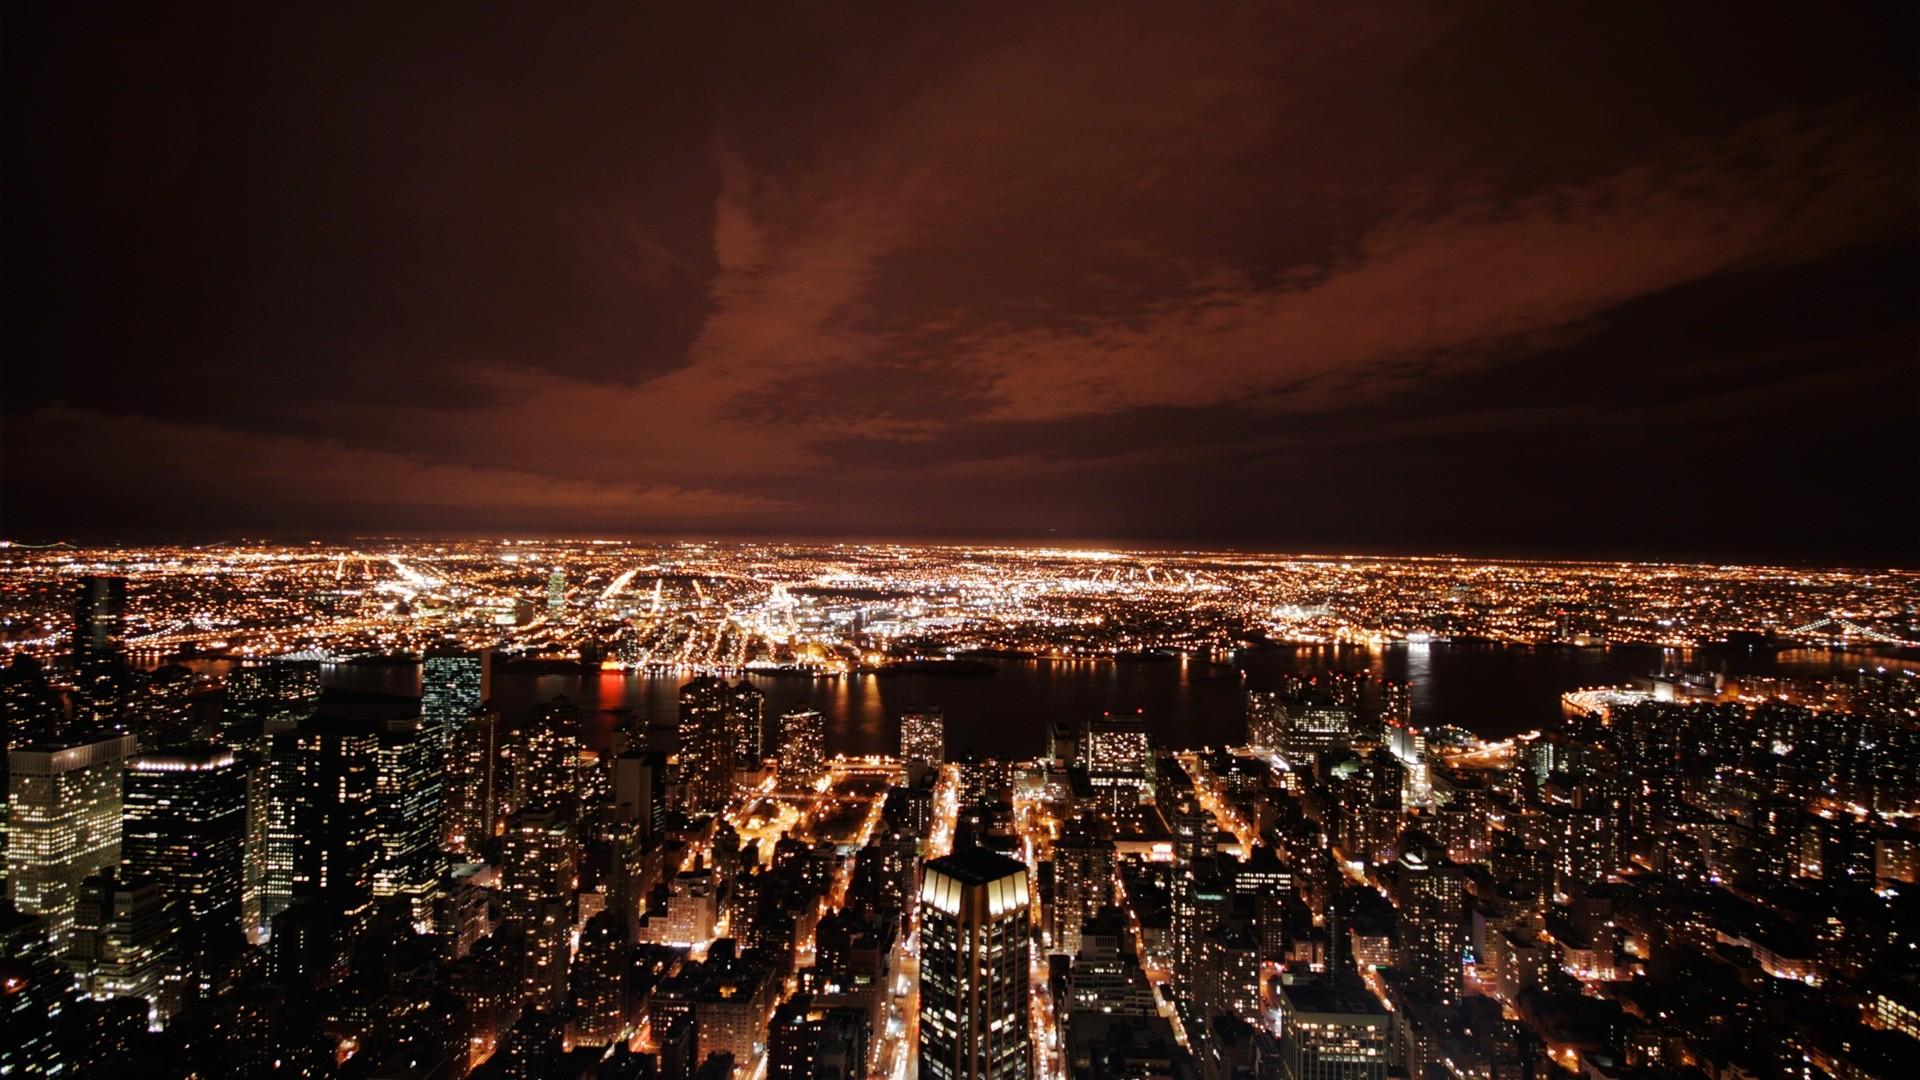 City Lights Background wallpaper